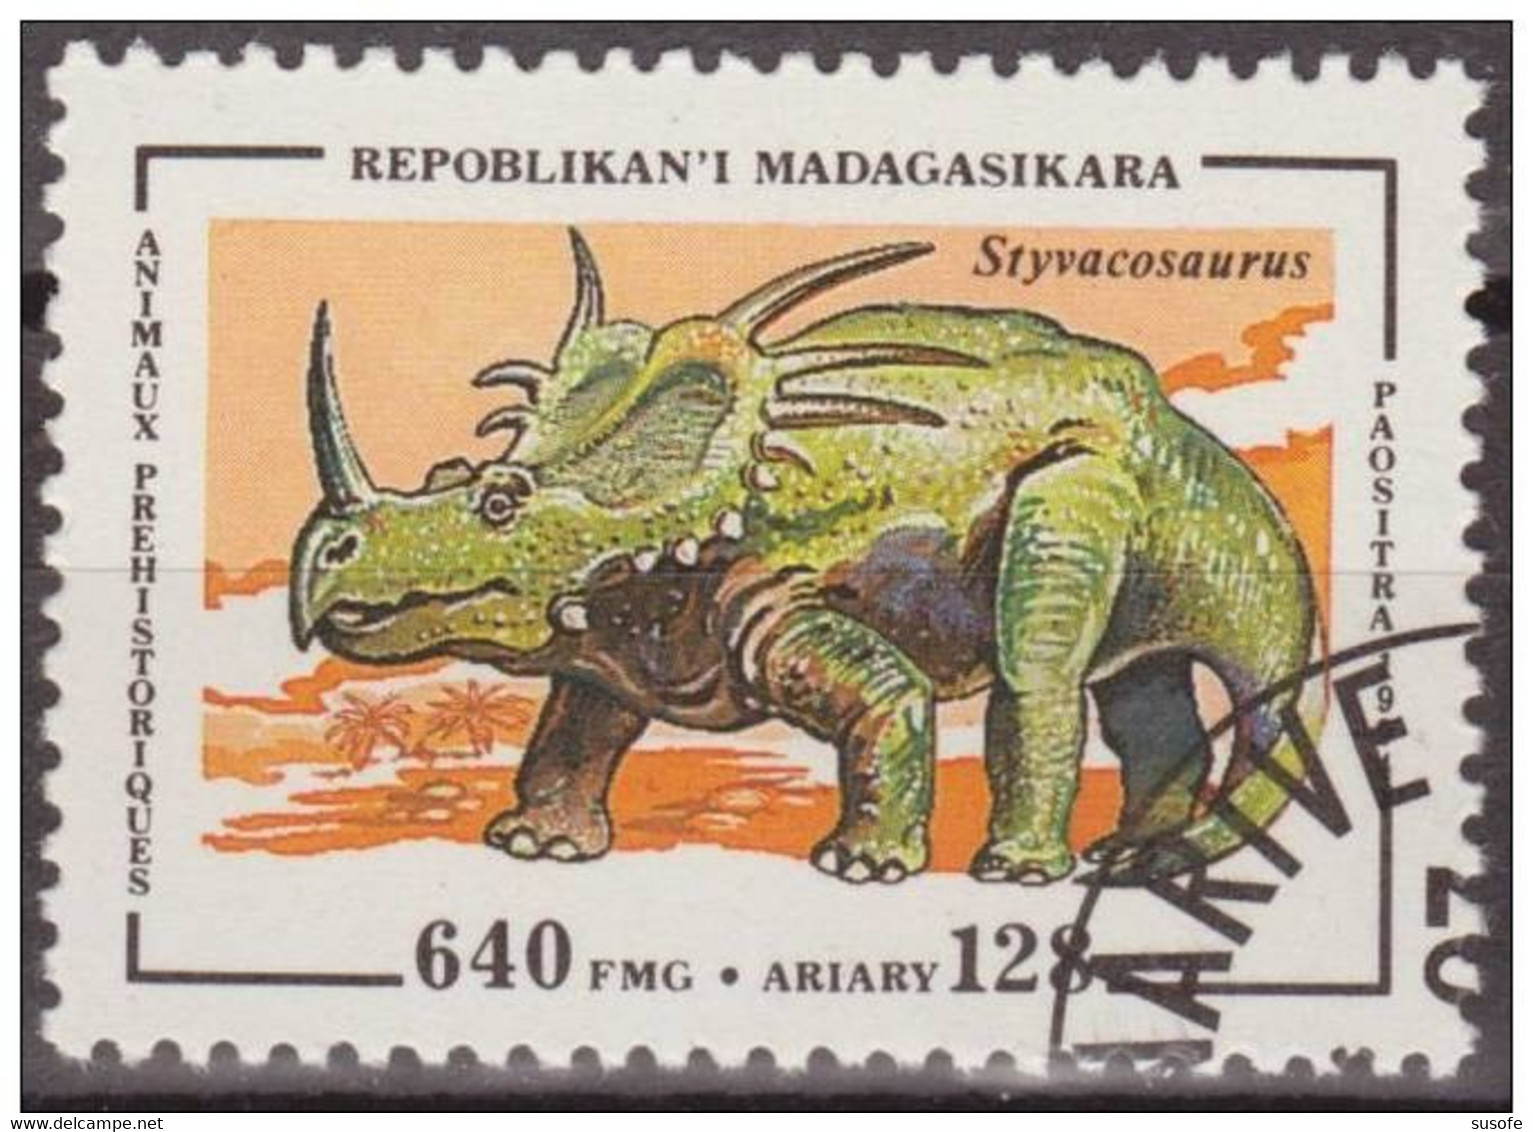 Madagascar 1994 Scott 1178 Sello * Animales Prehistoricos Styvacosaurus 640Fmg Malagasy Madagascar Stamps Timbre - Madagascar (1960-...)